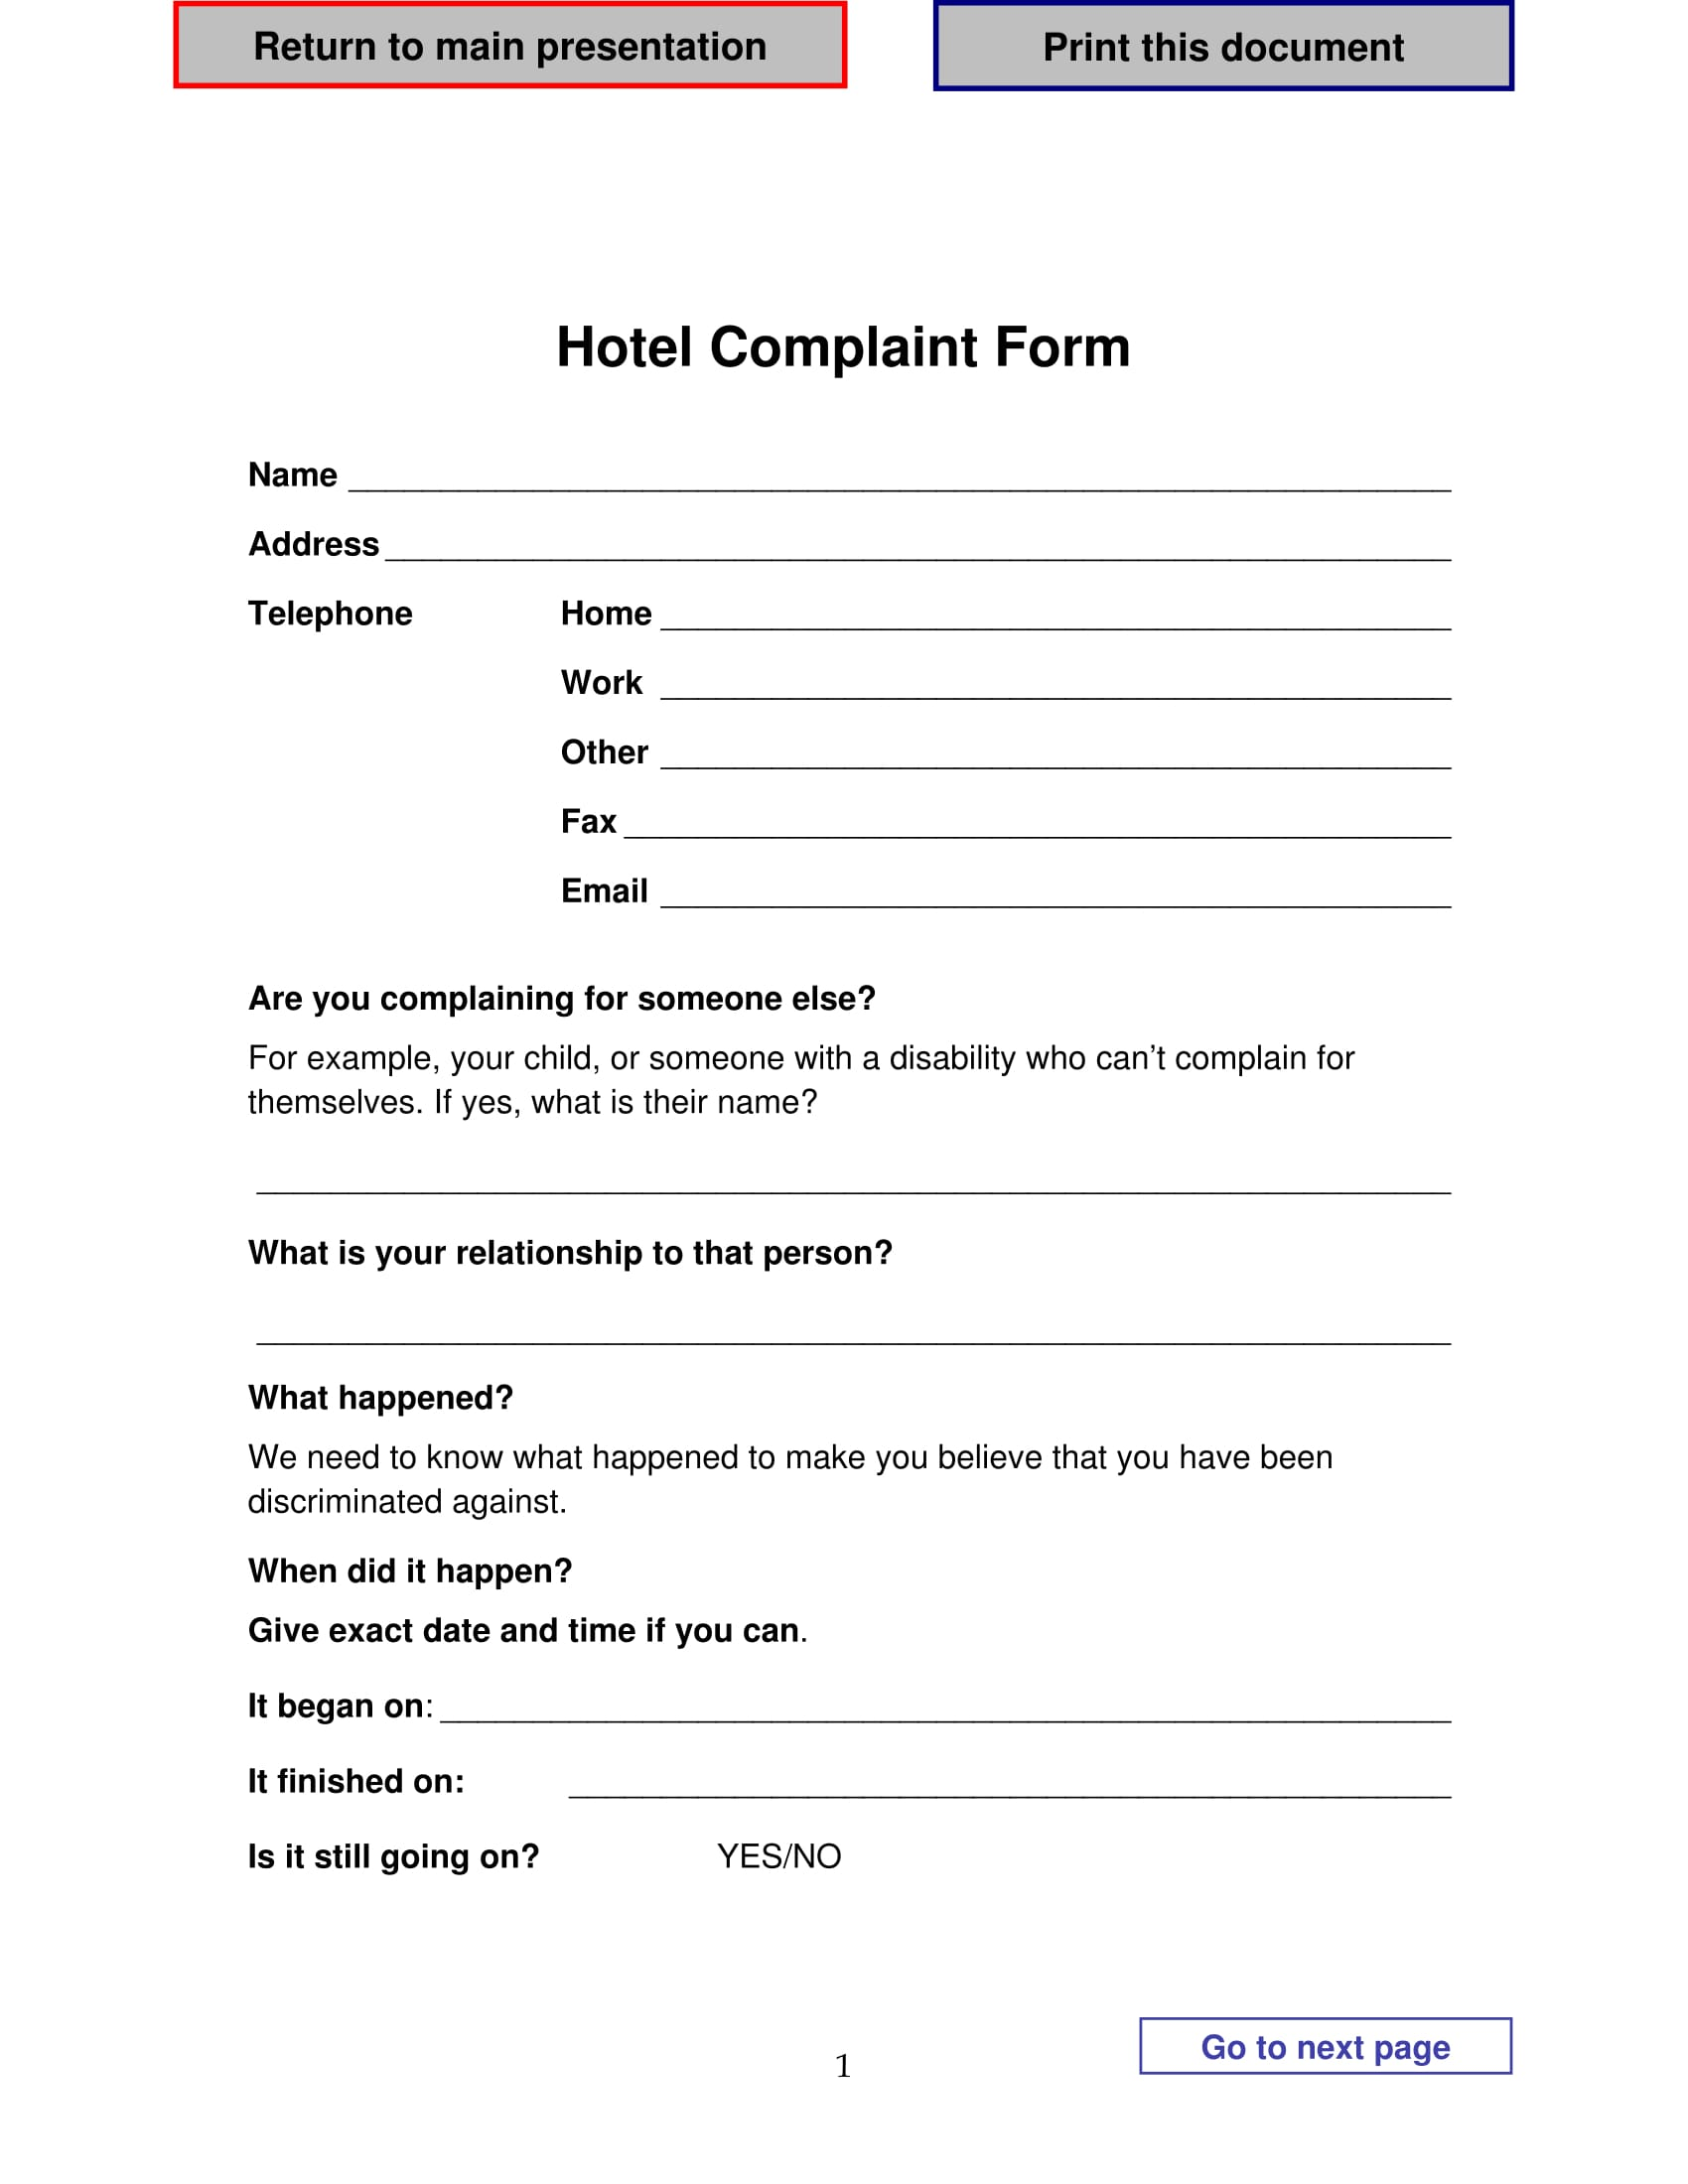 hotel complaint form 1